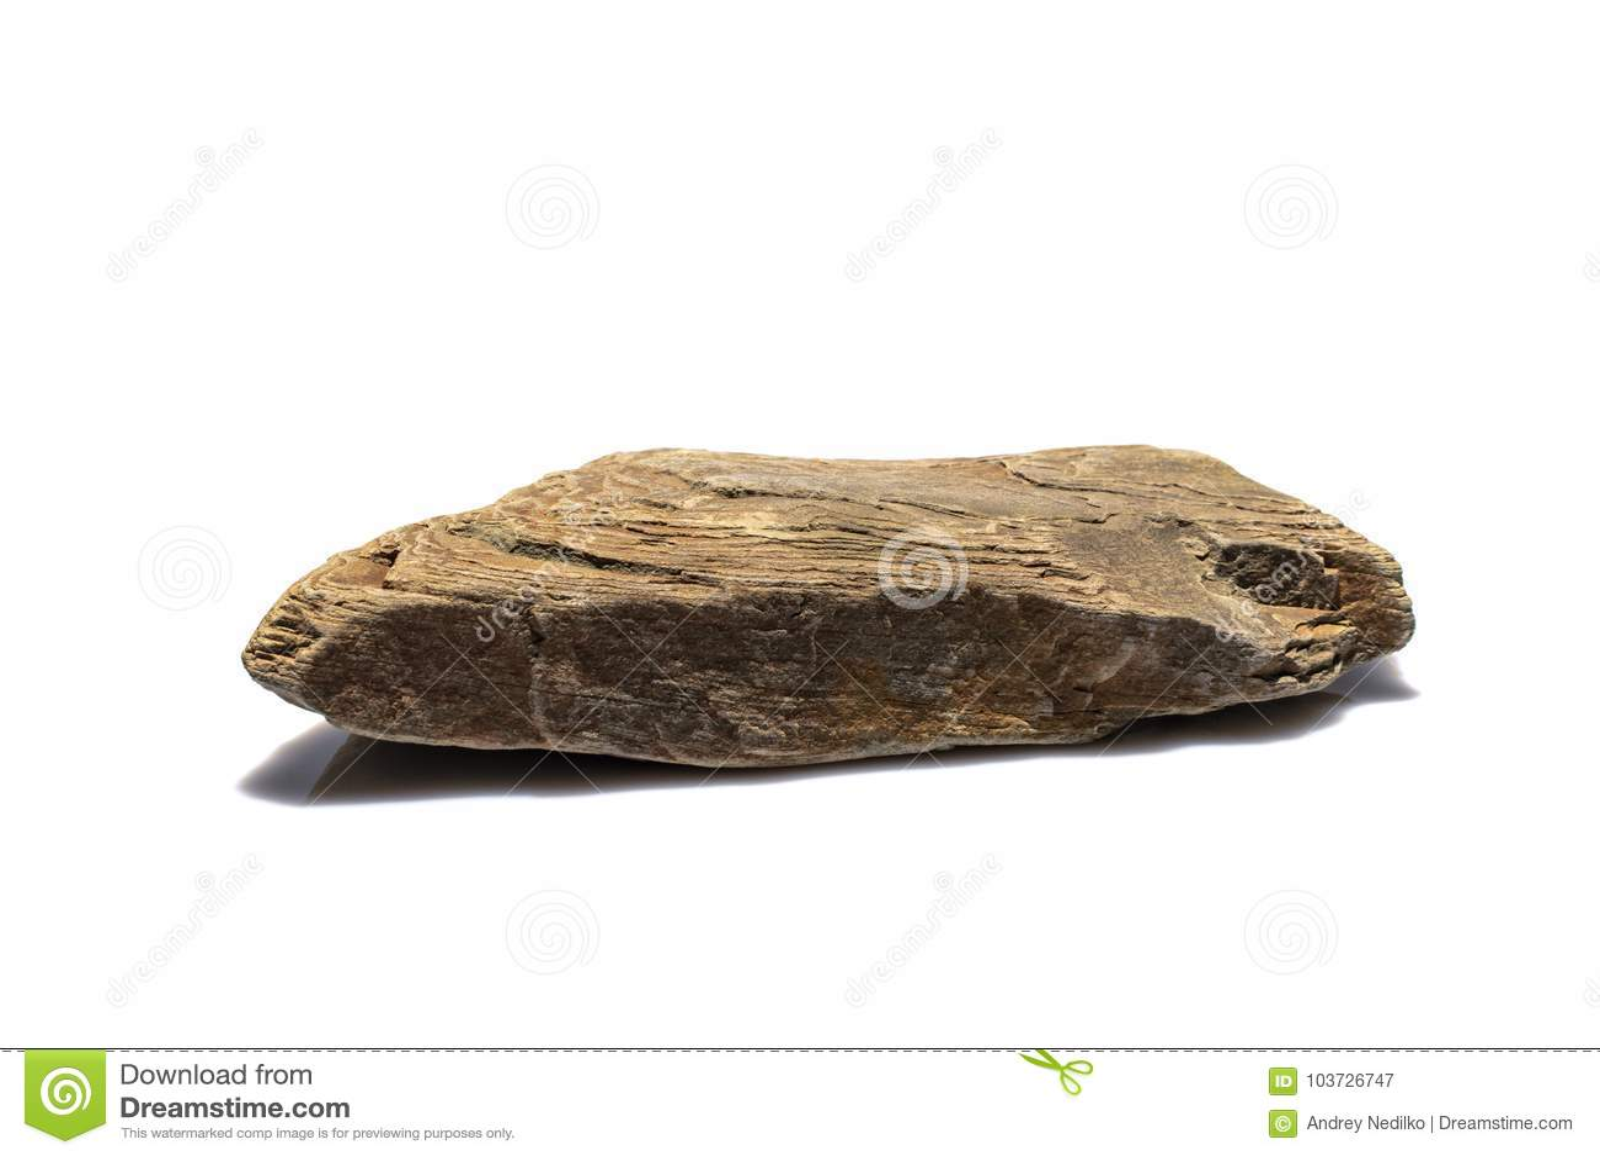 Stone με μια βαλμένη σε στρώσεις δομή σε ένα άσπρο υπόβαθρο